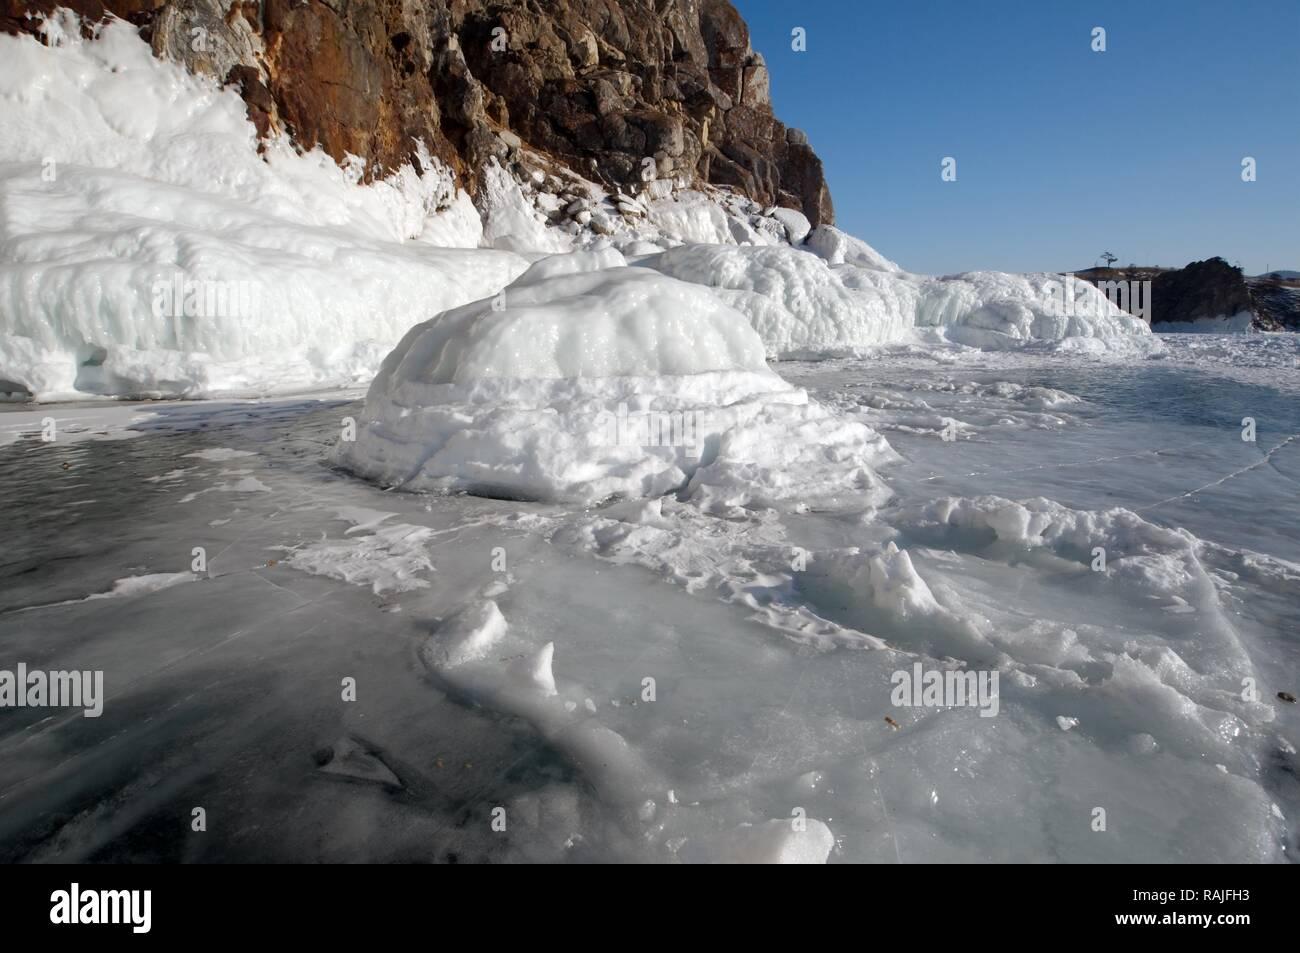 Ice, Olkhon island, Lake Baikal, Siberia, Russia, Eurasia - Stock Image